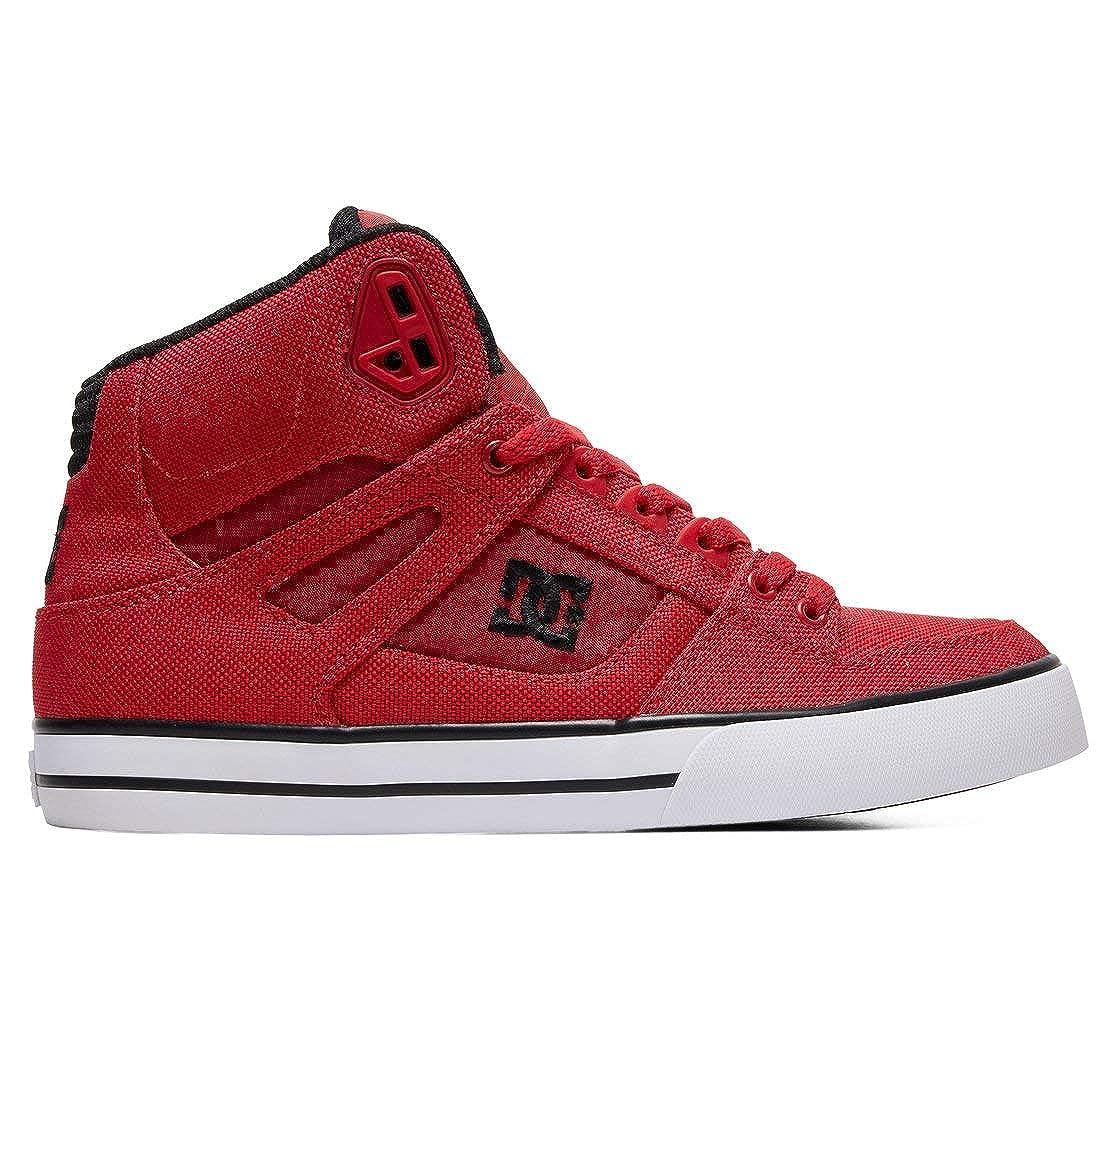 DC schuhe Pure WC TX SE - High-Top-Schuhe für Männer ADYS400046